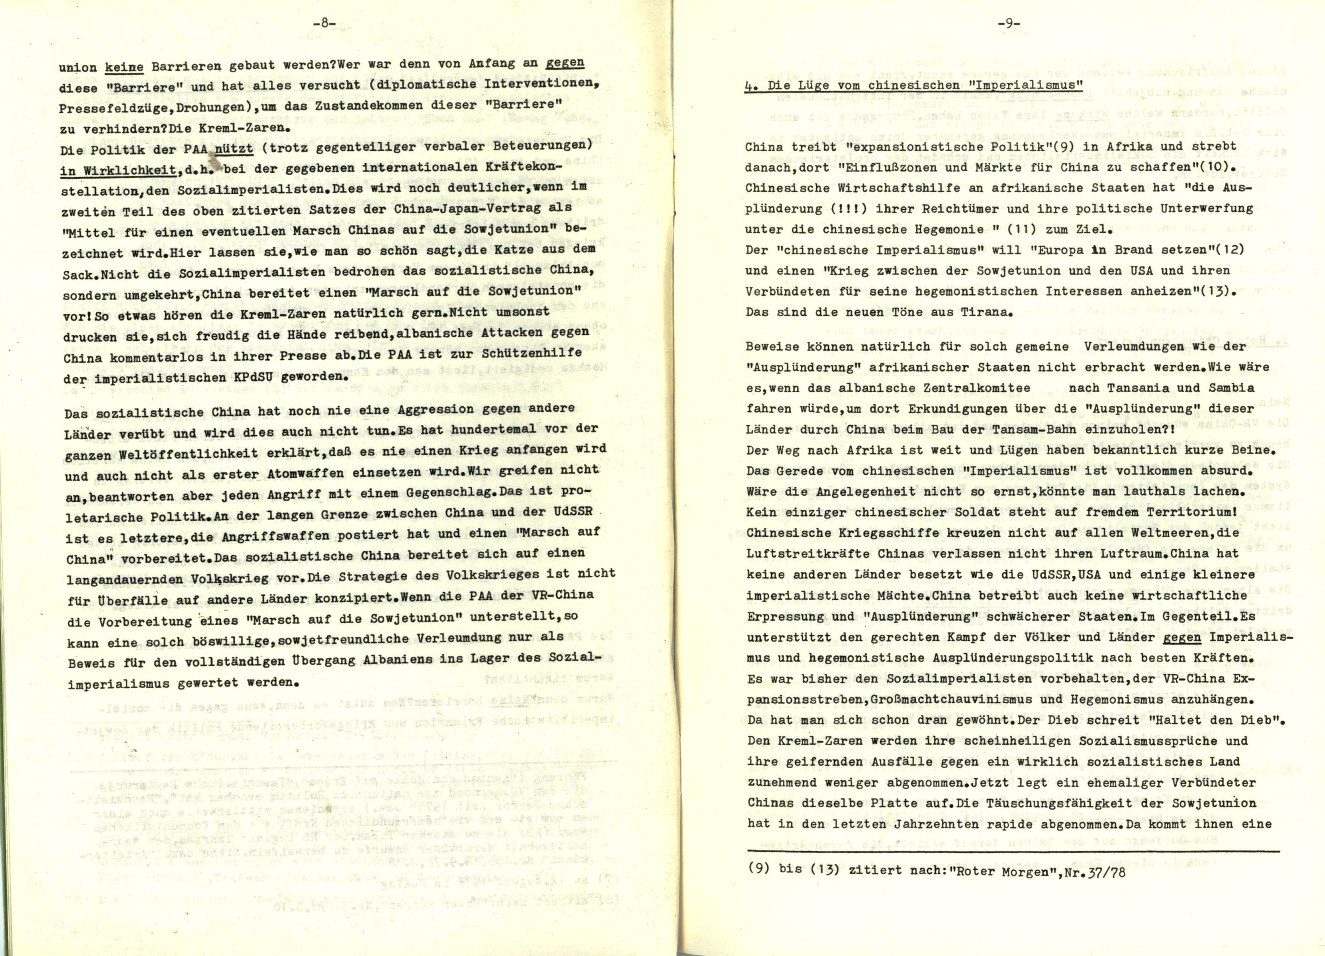 Muenchen_Kampf_dem_Revisionismus_1978_08_05